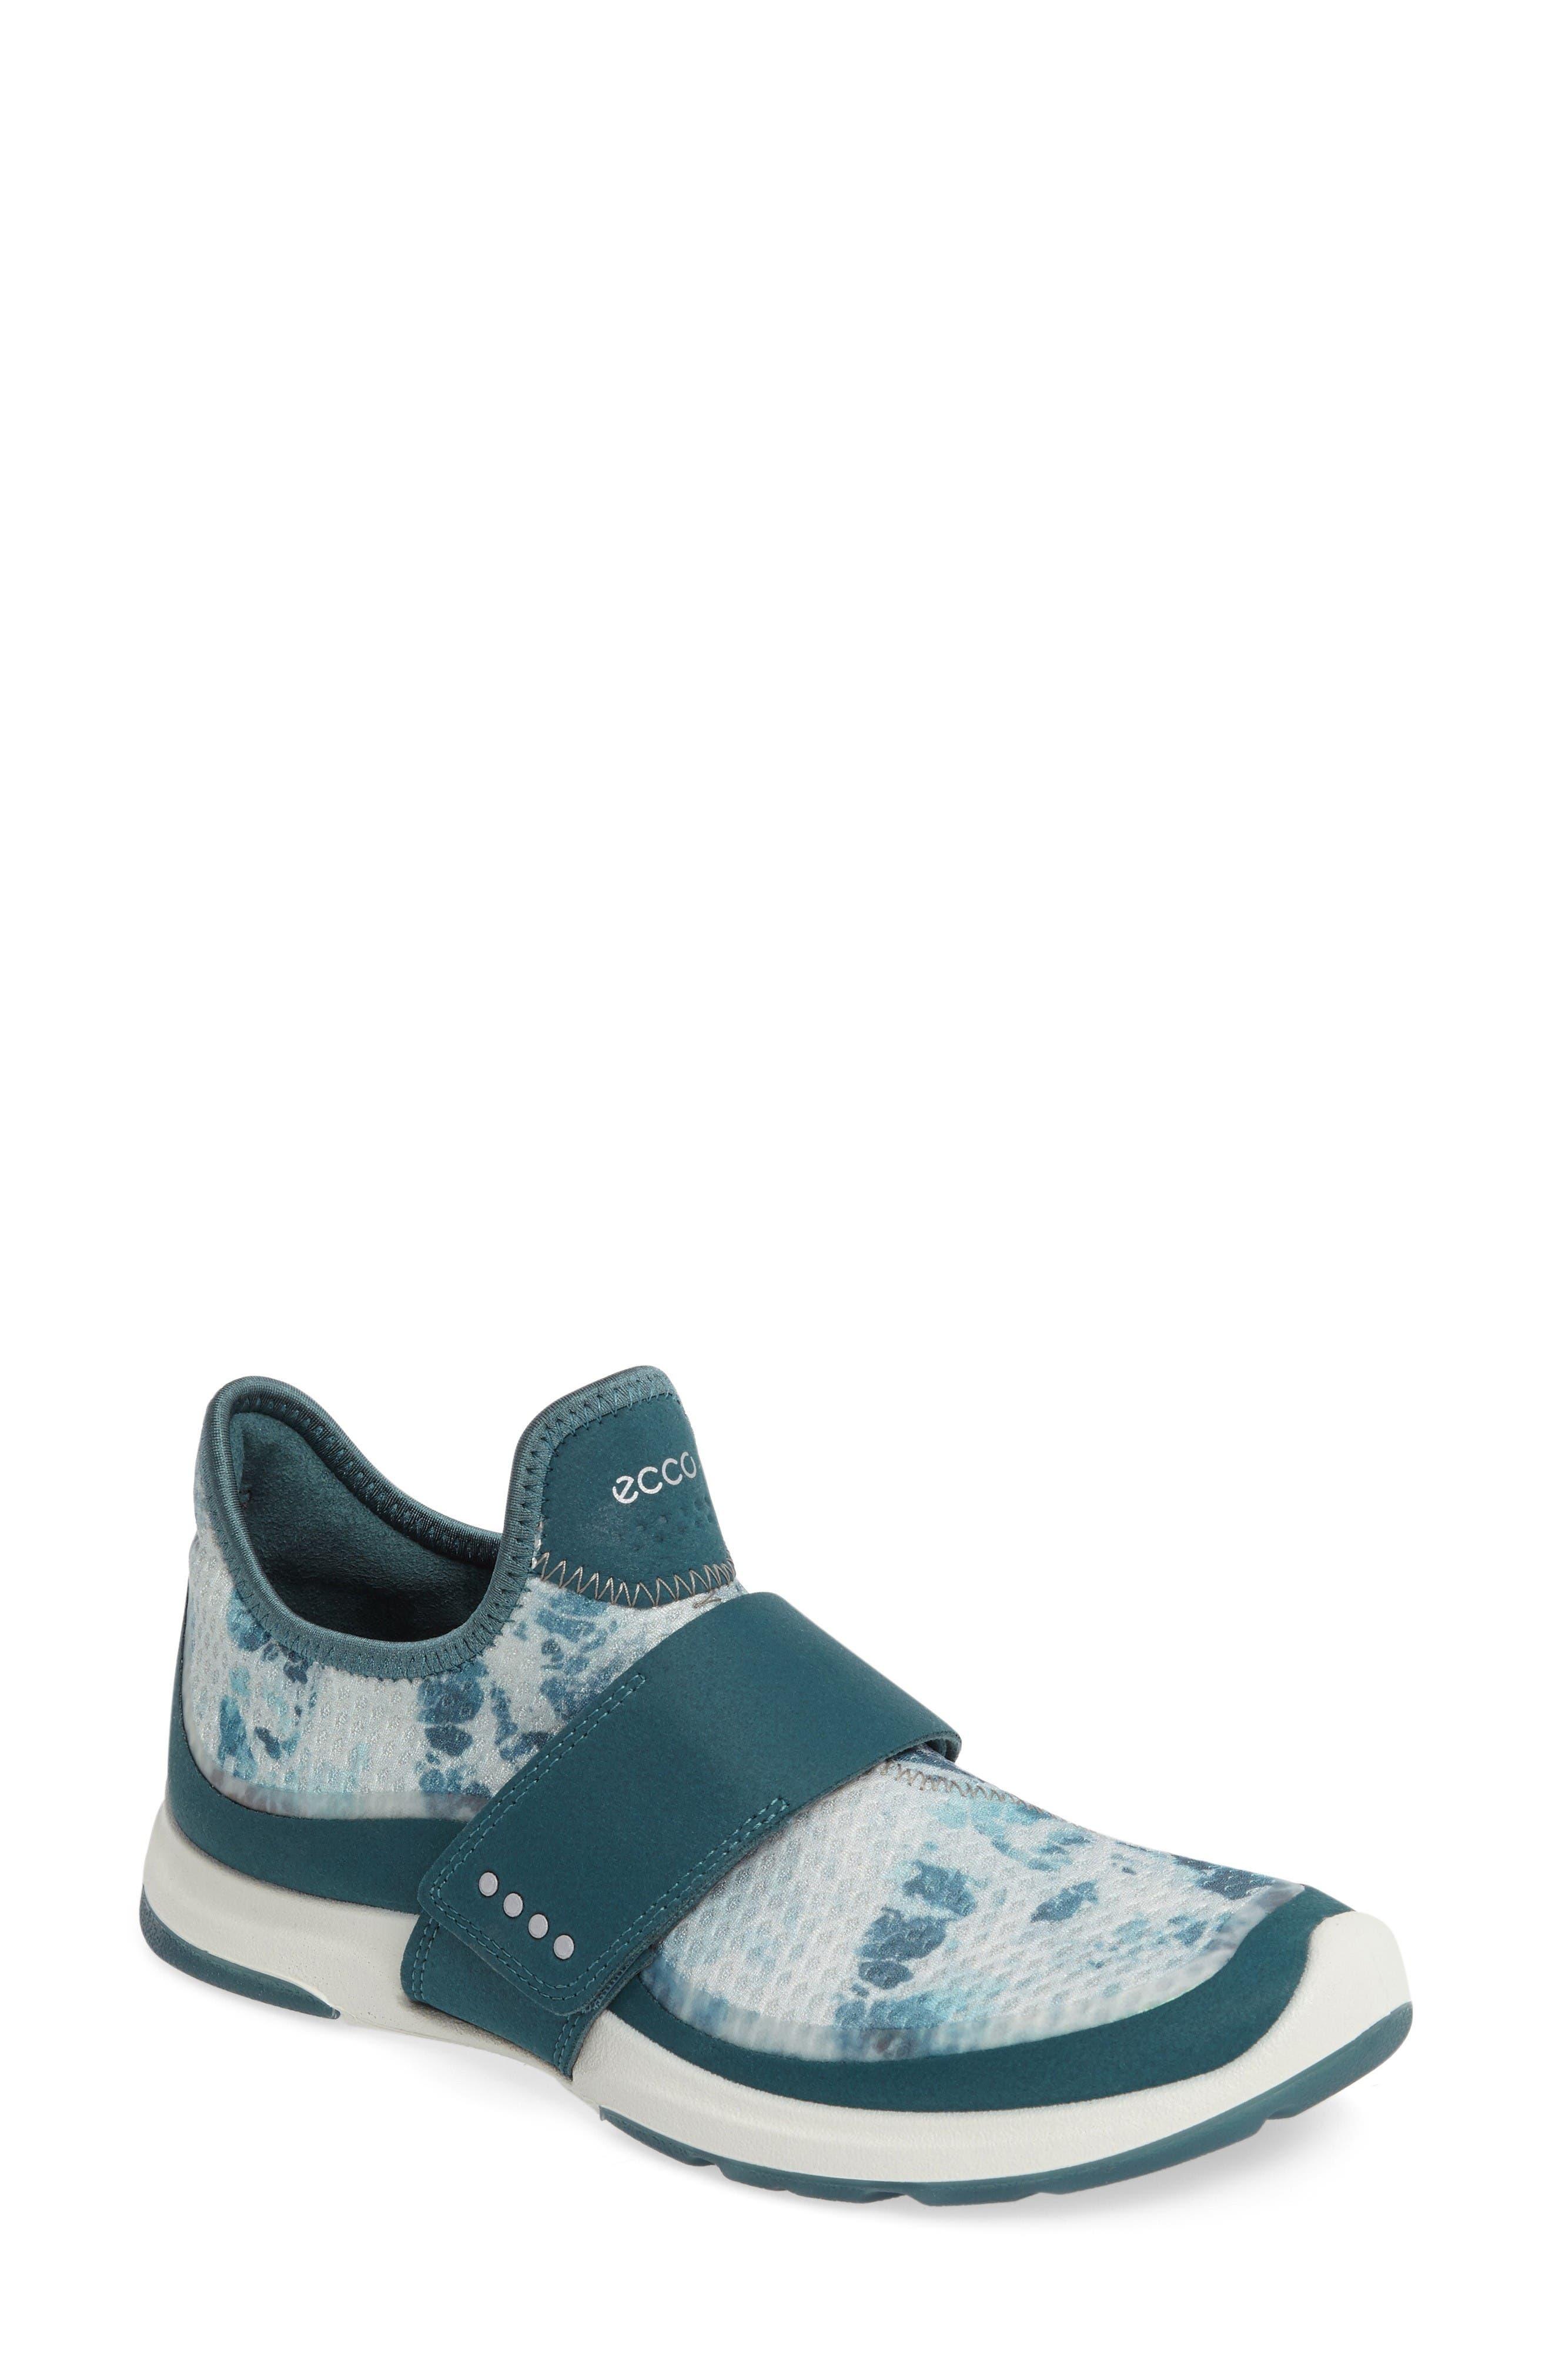 ECCO BIOM Amrap Band Sneaker (Women)